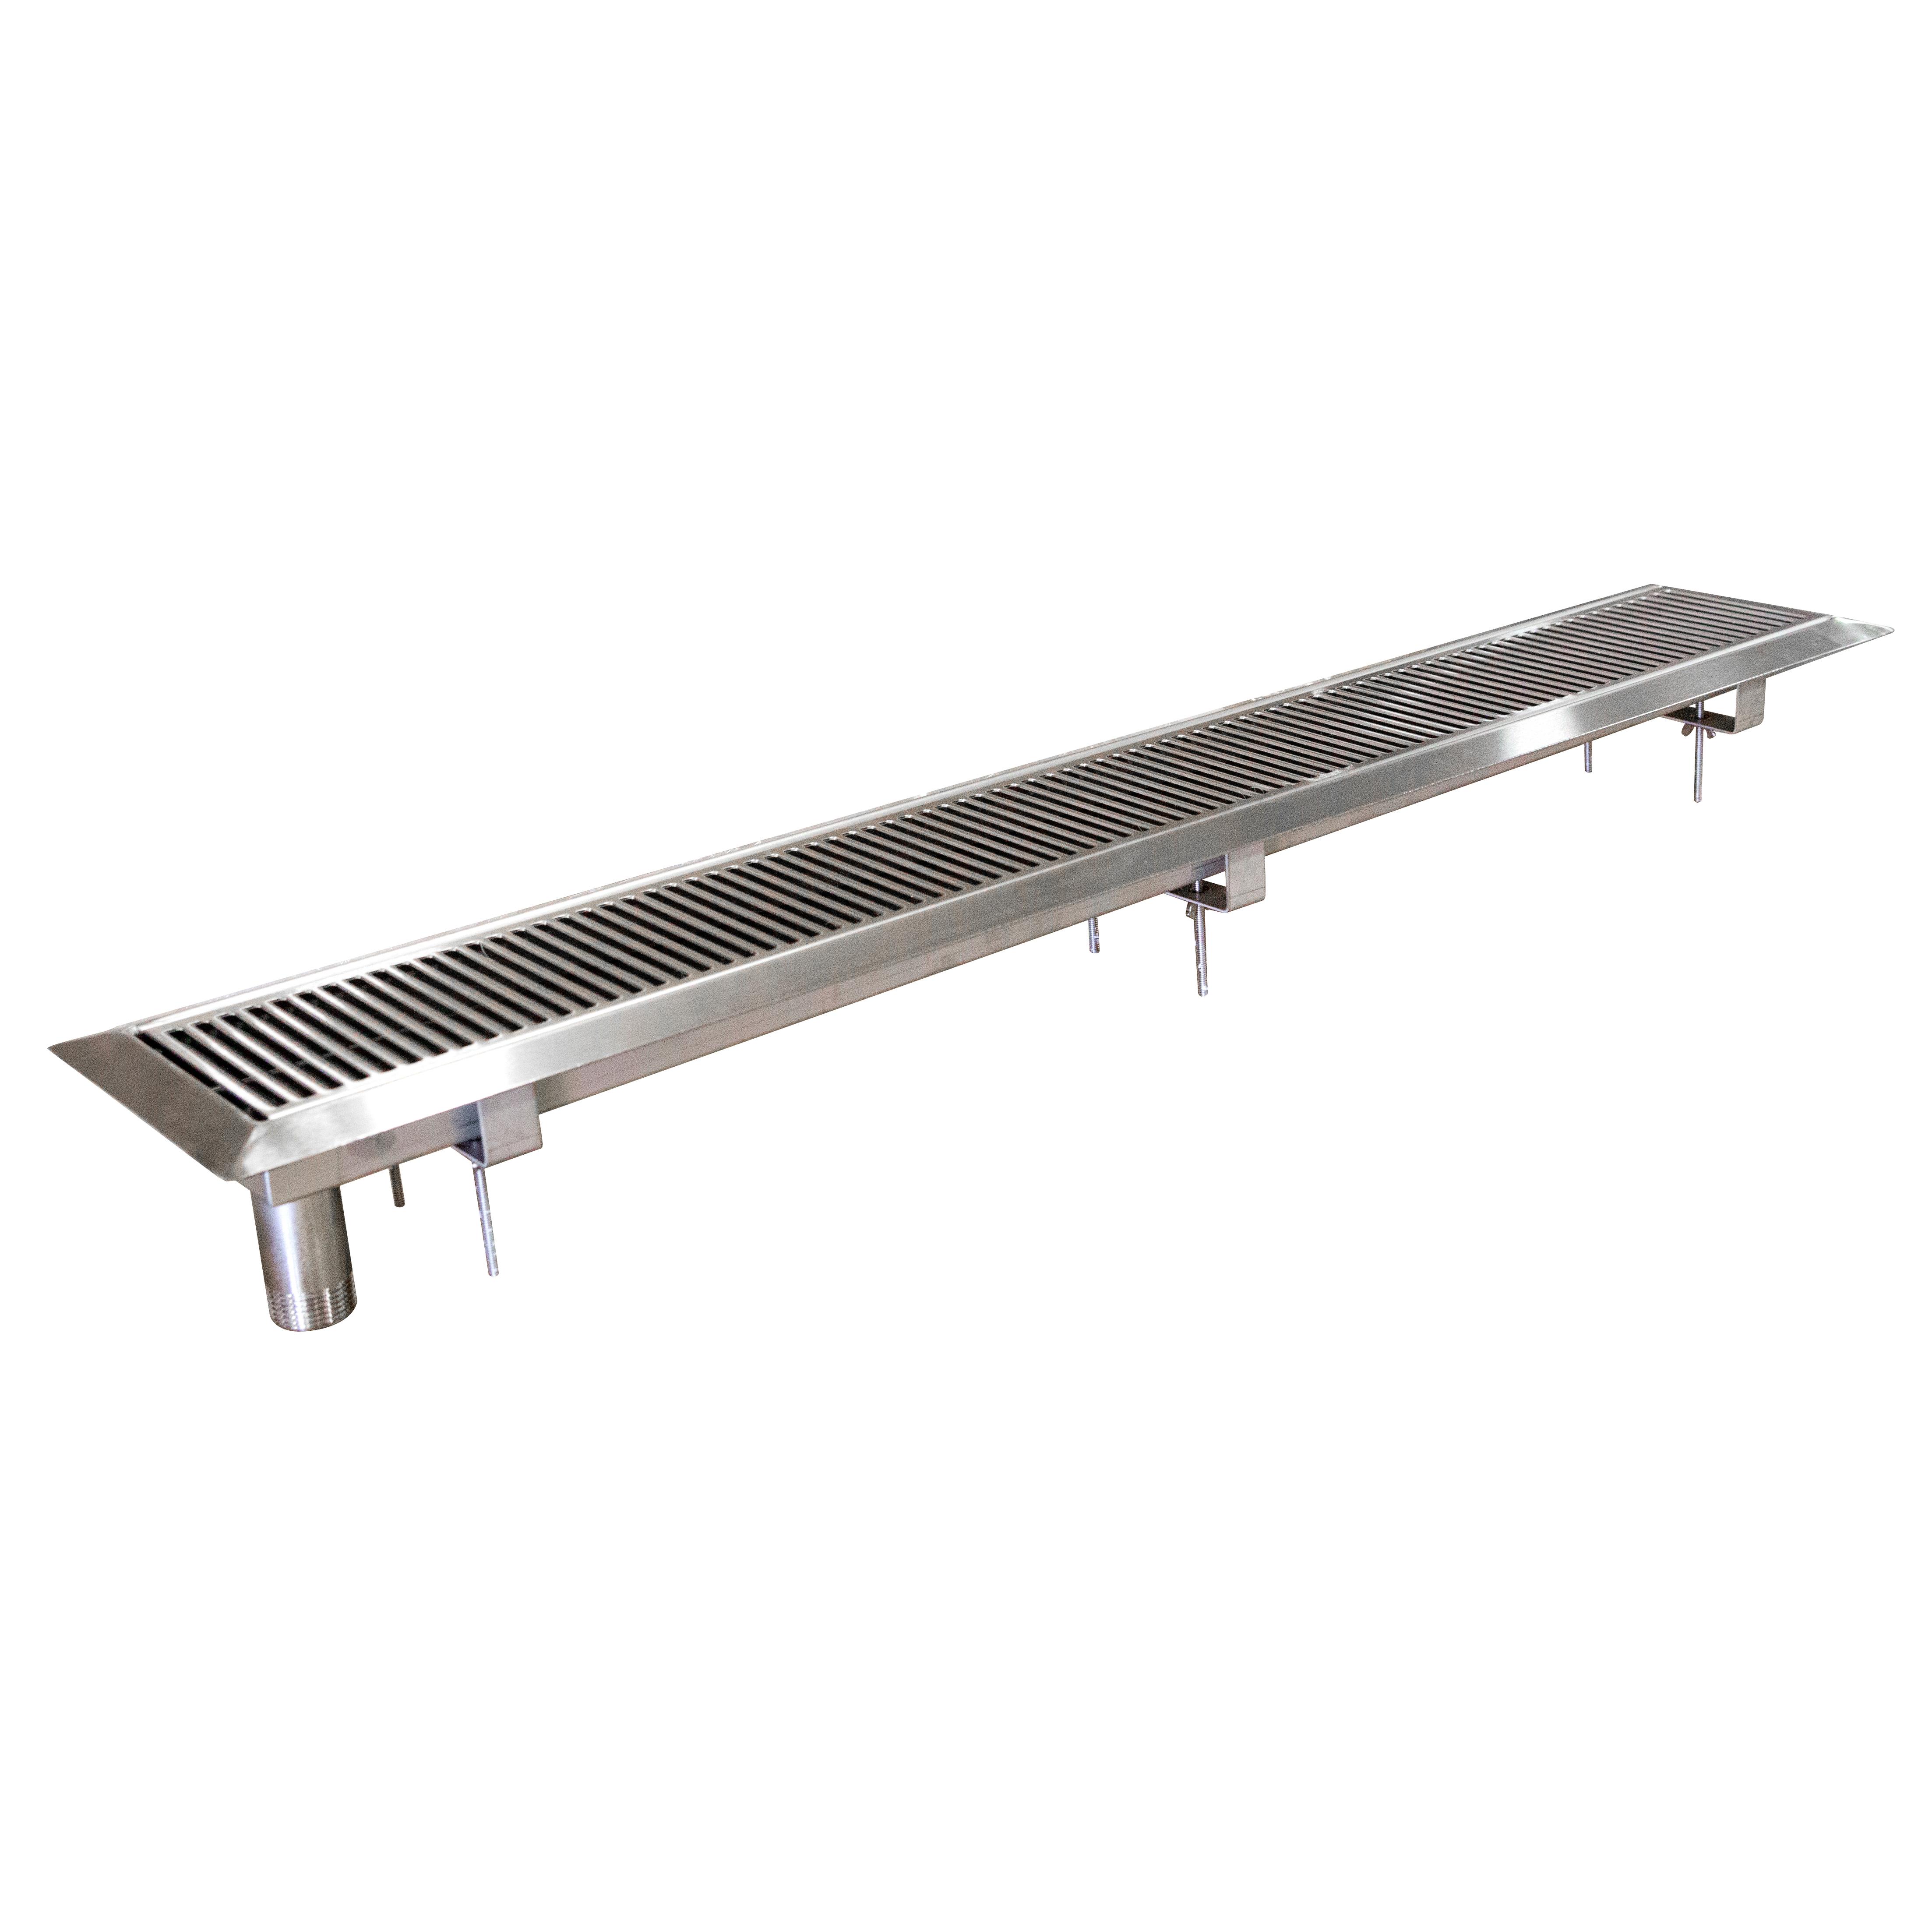 John Boos URN48 drip tray trough, beverage